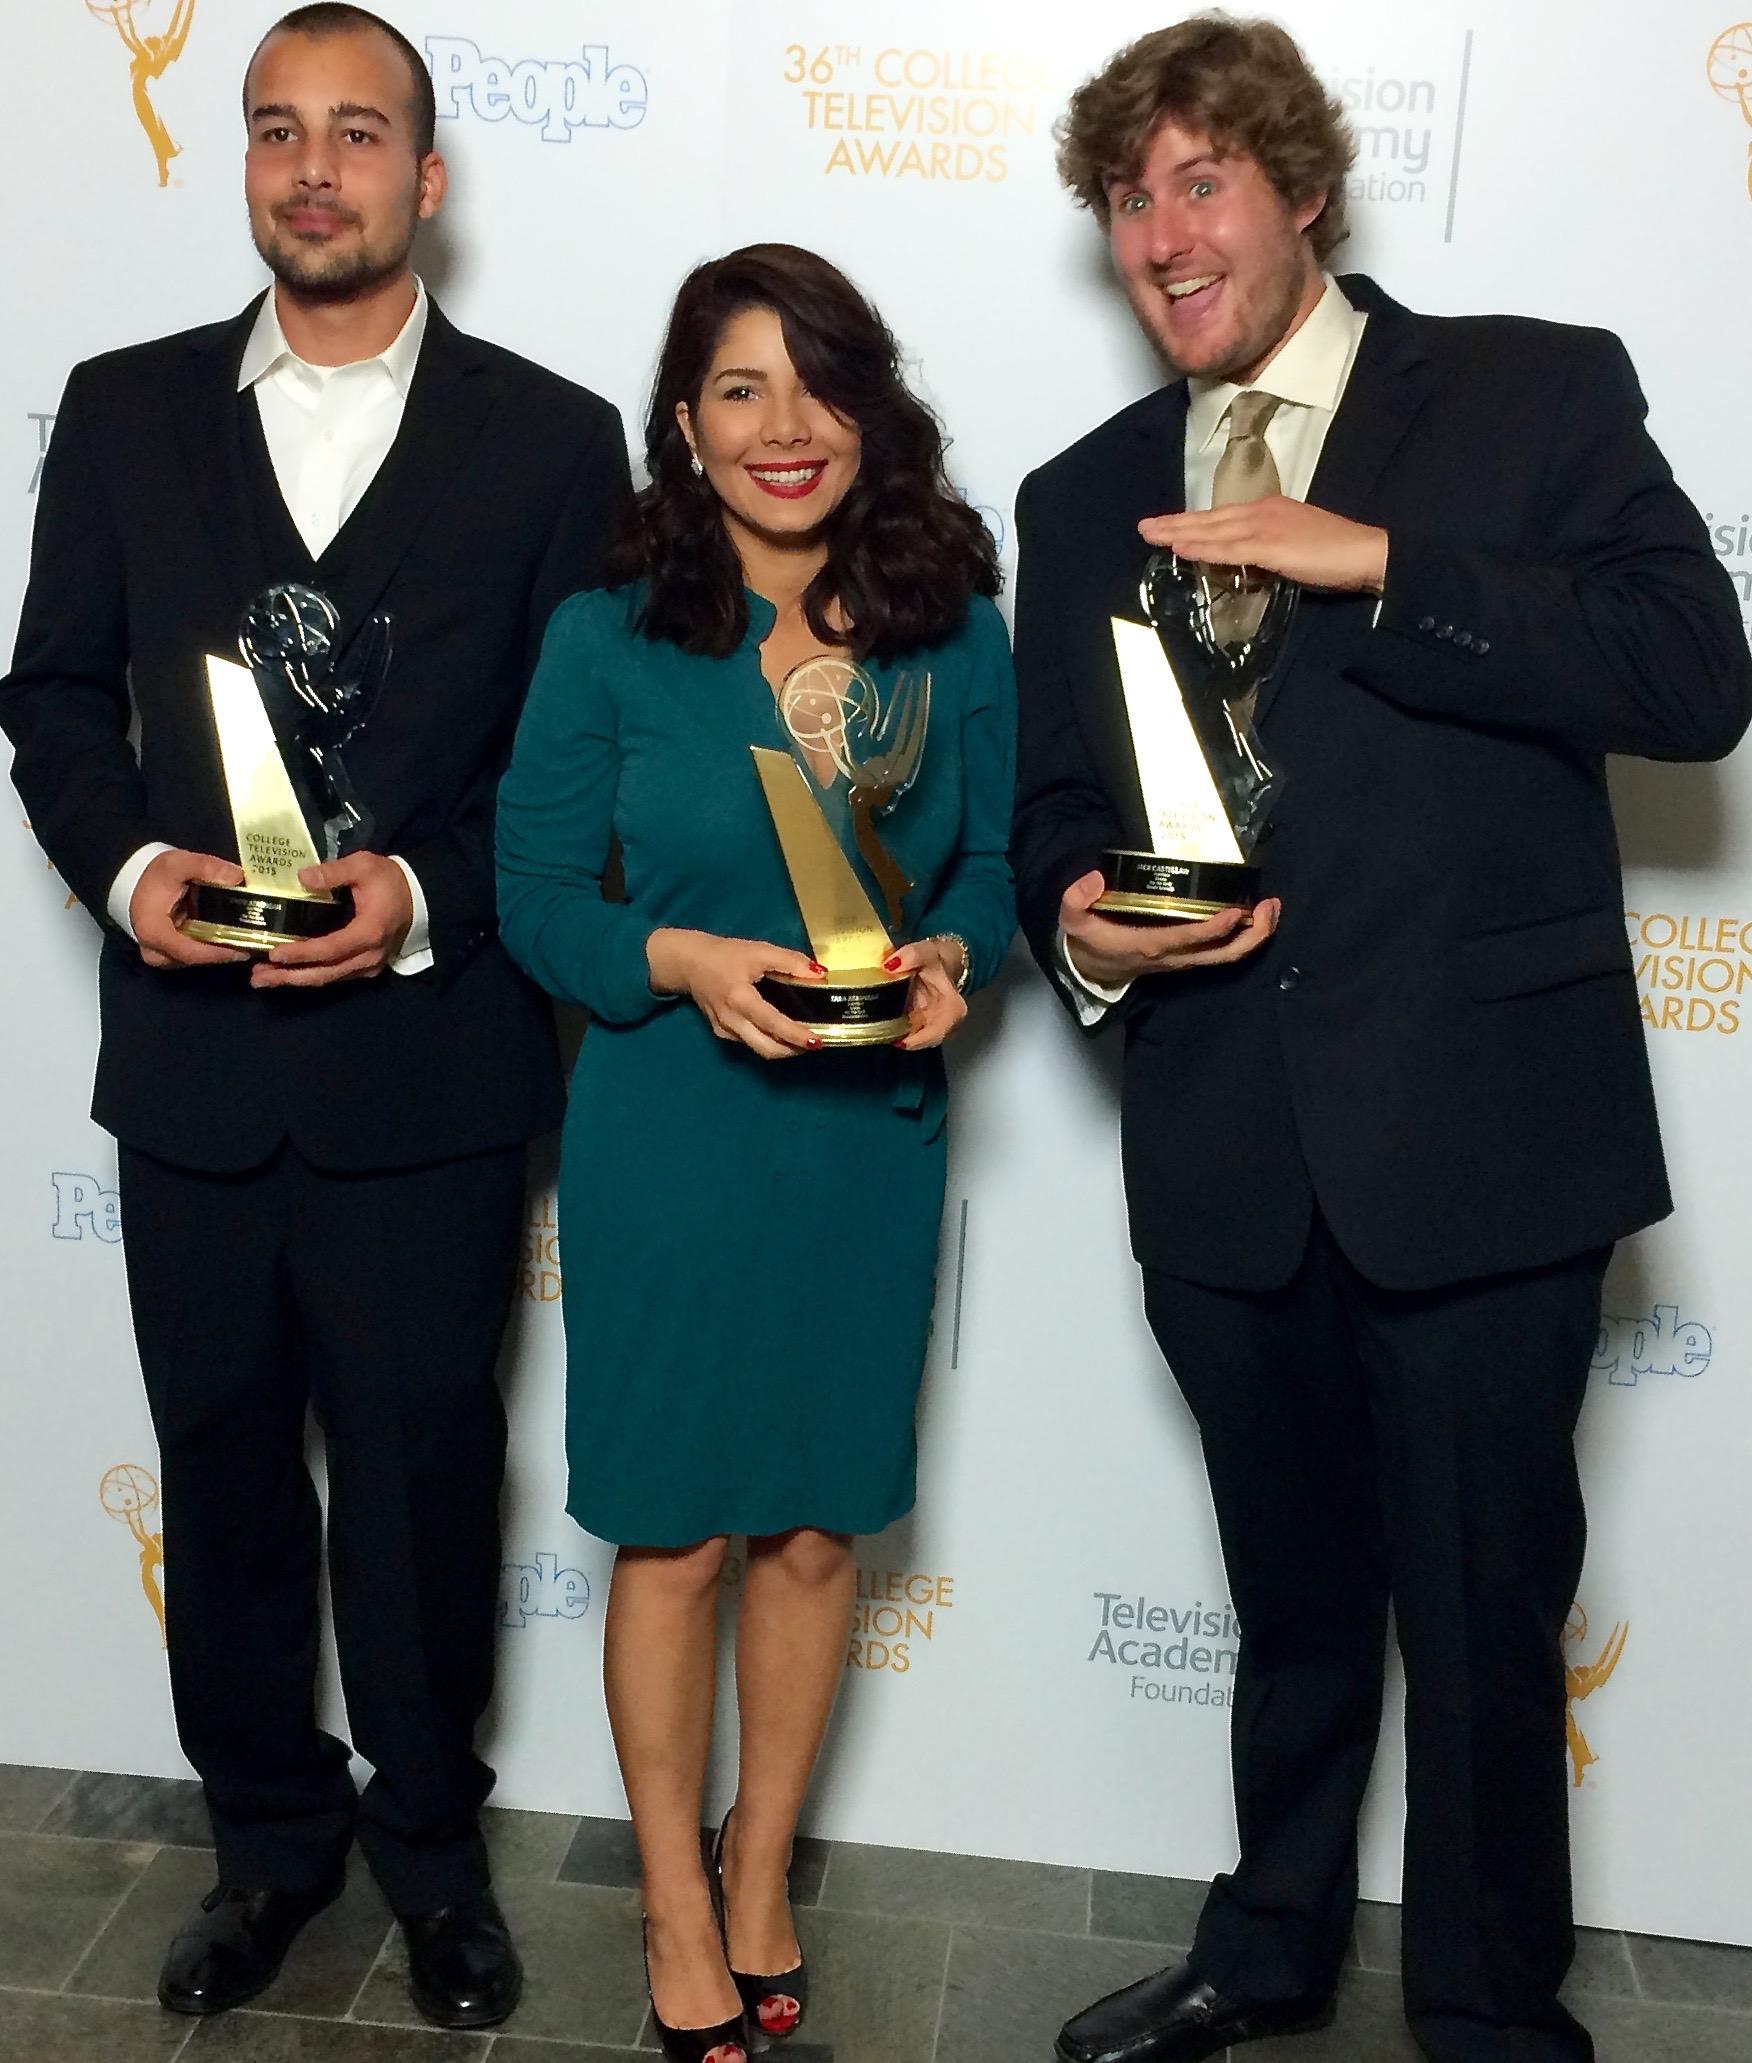 College Emmy Awards . Orod Atashgah, Tara Atashgah & Jack Castellaw .